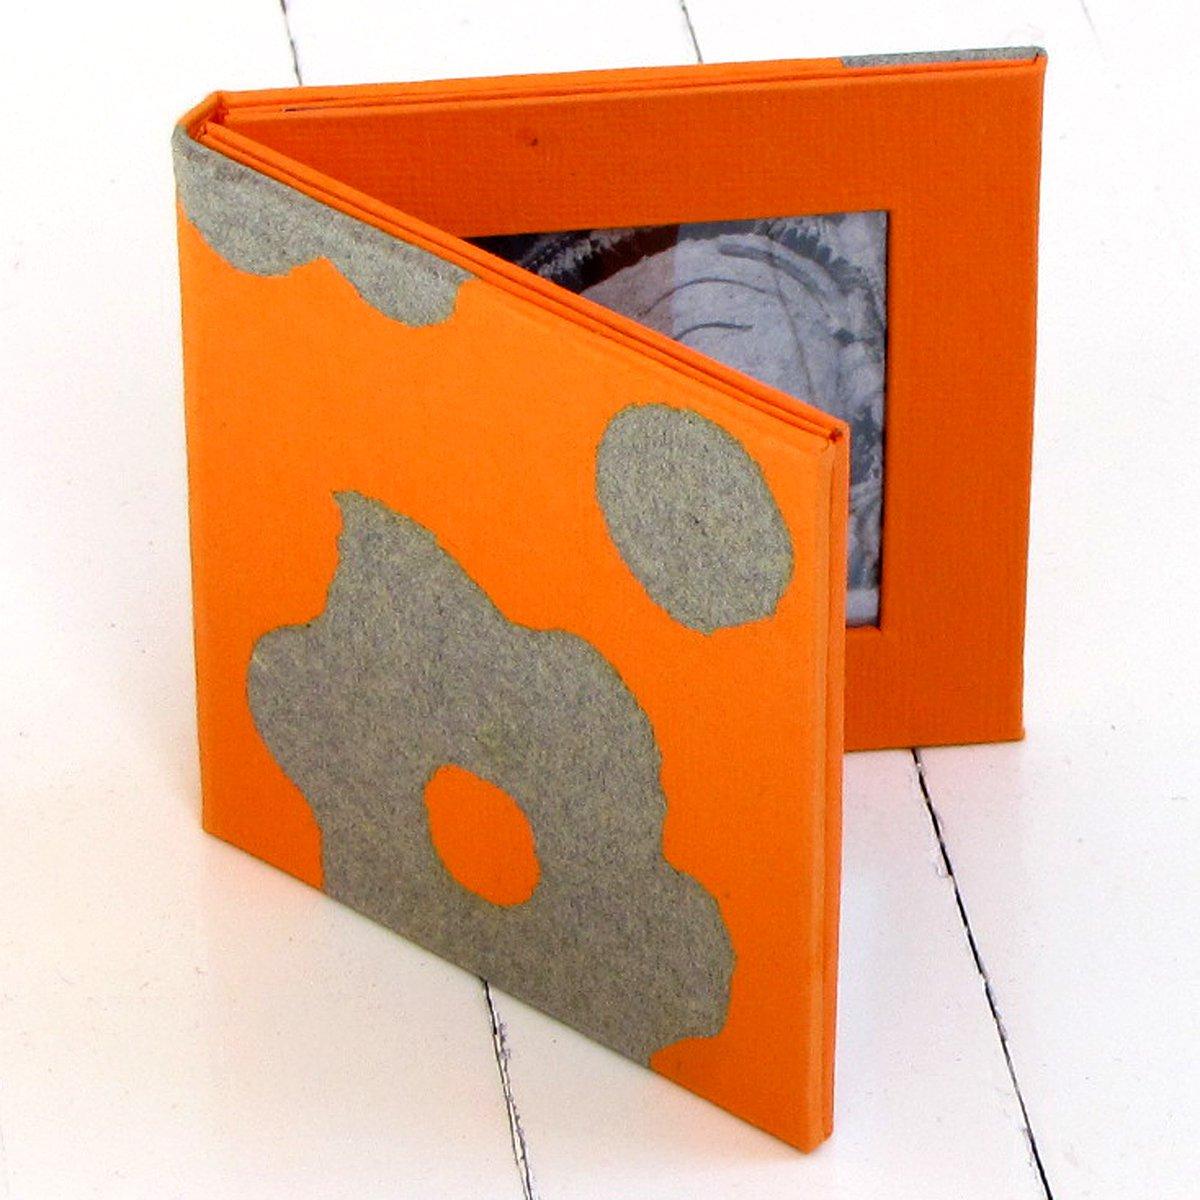 Folding double photo picture frame 2.5x2.5 acid free handmade flower craft paper arts orange/gray